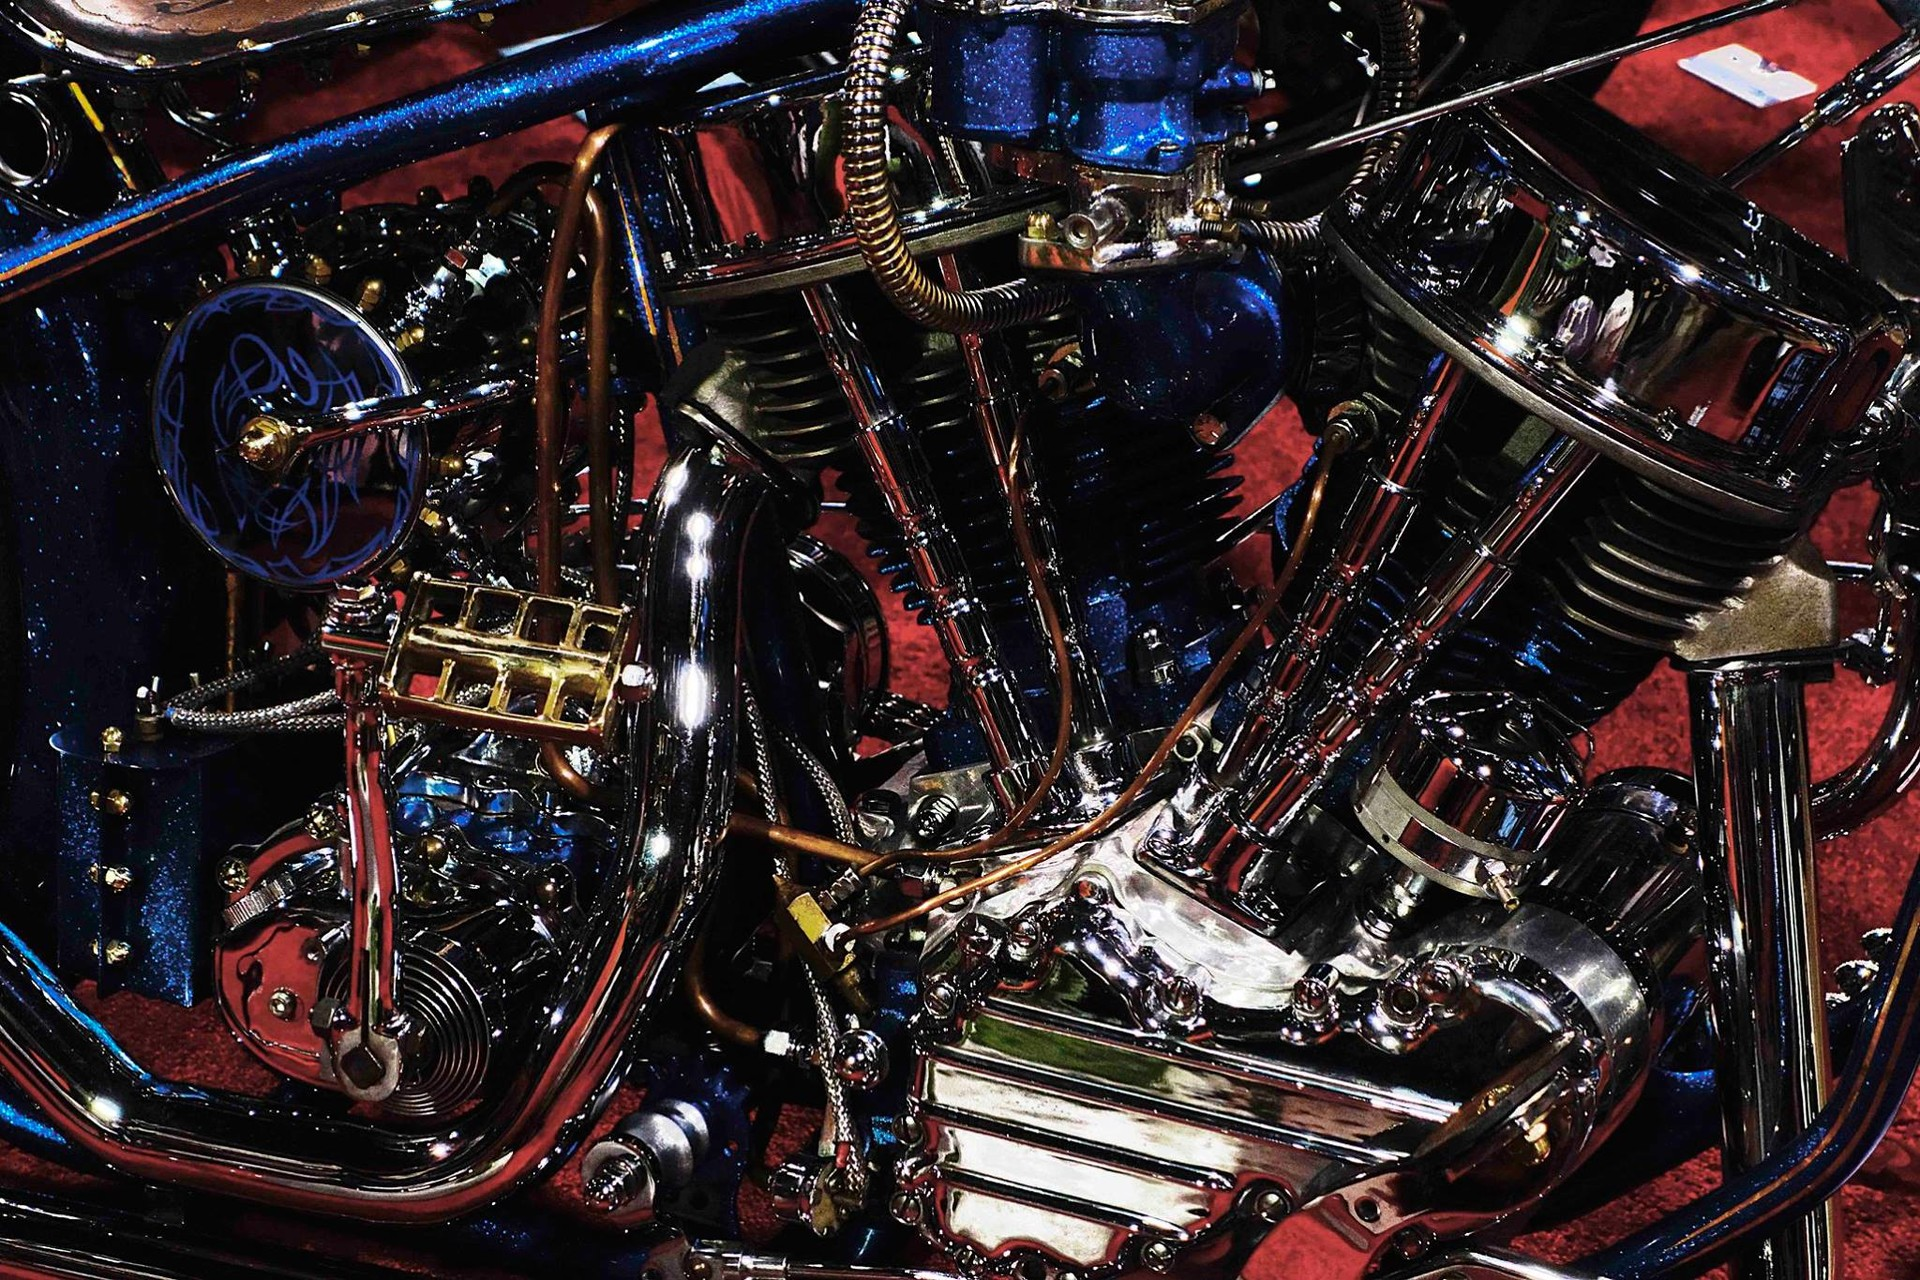 ArtStation - Vince Mancuso - Motorcycle super show at the Toronto